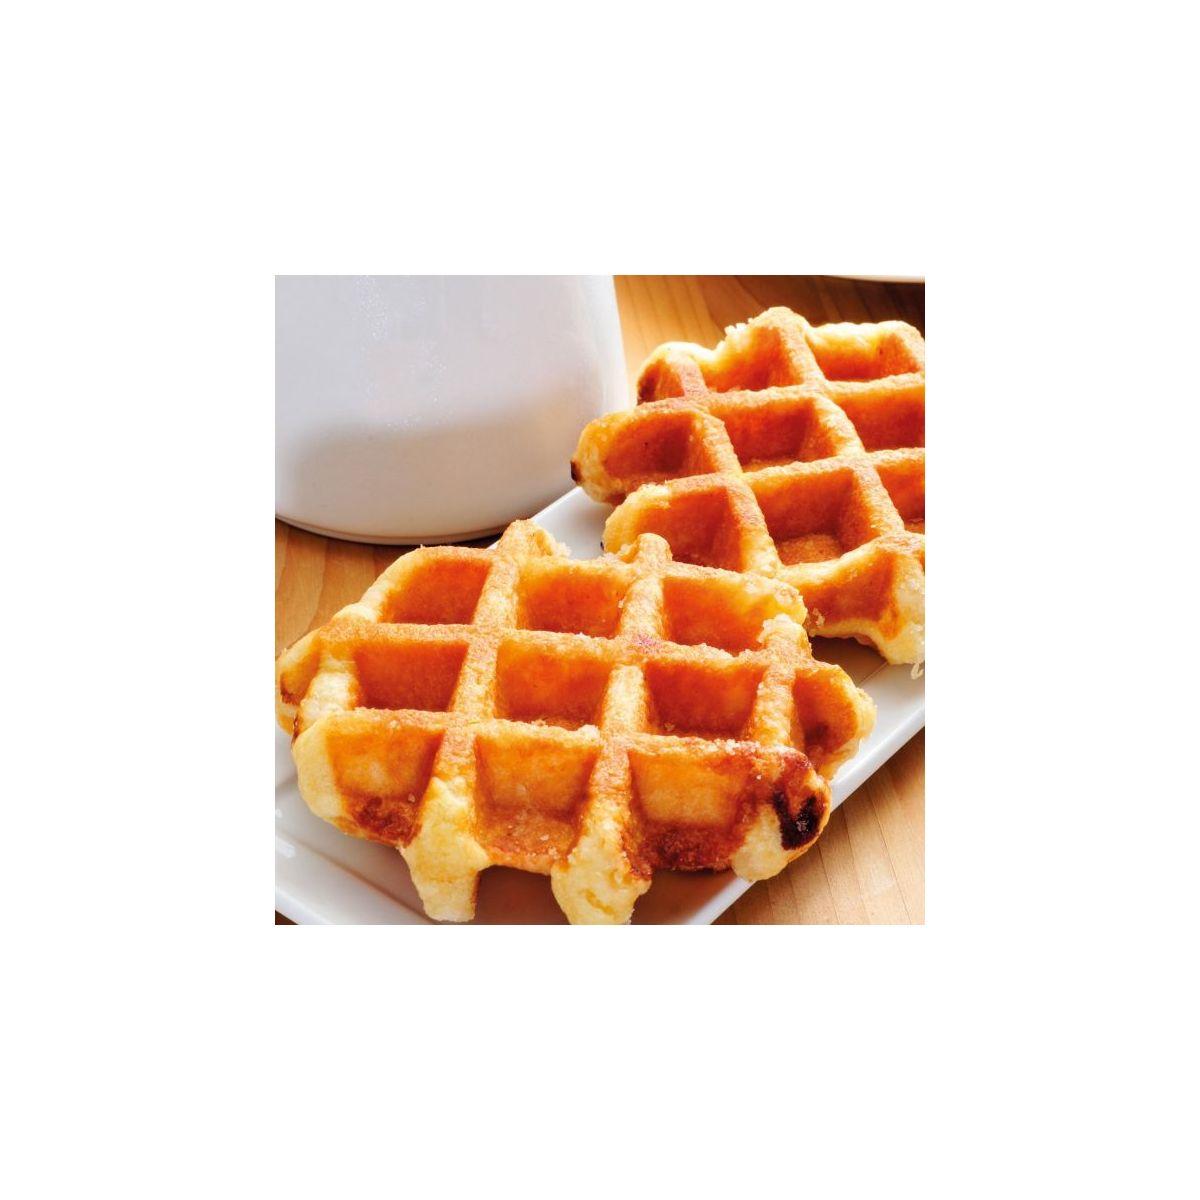 Image - Belgian waffles